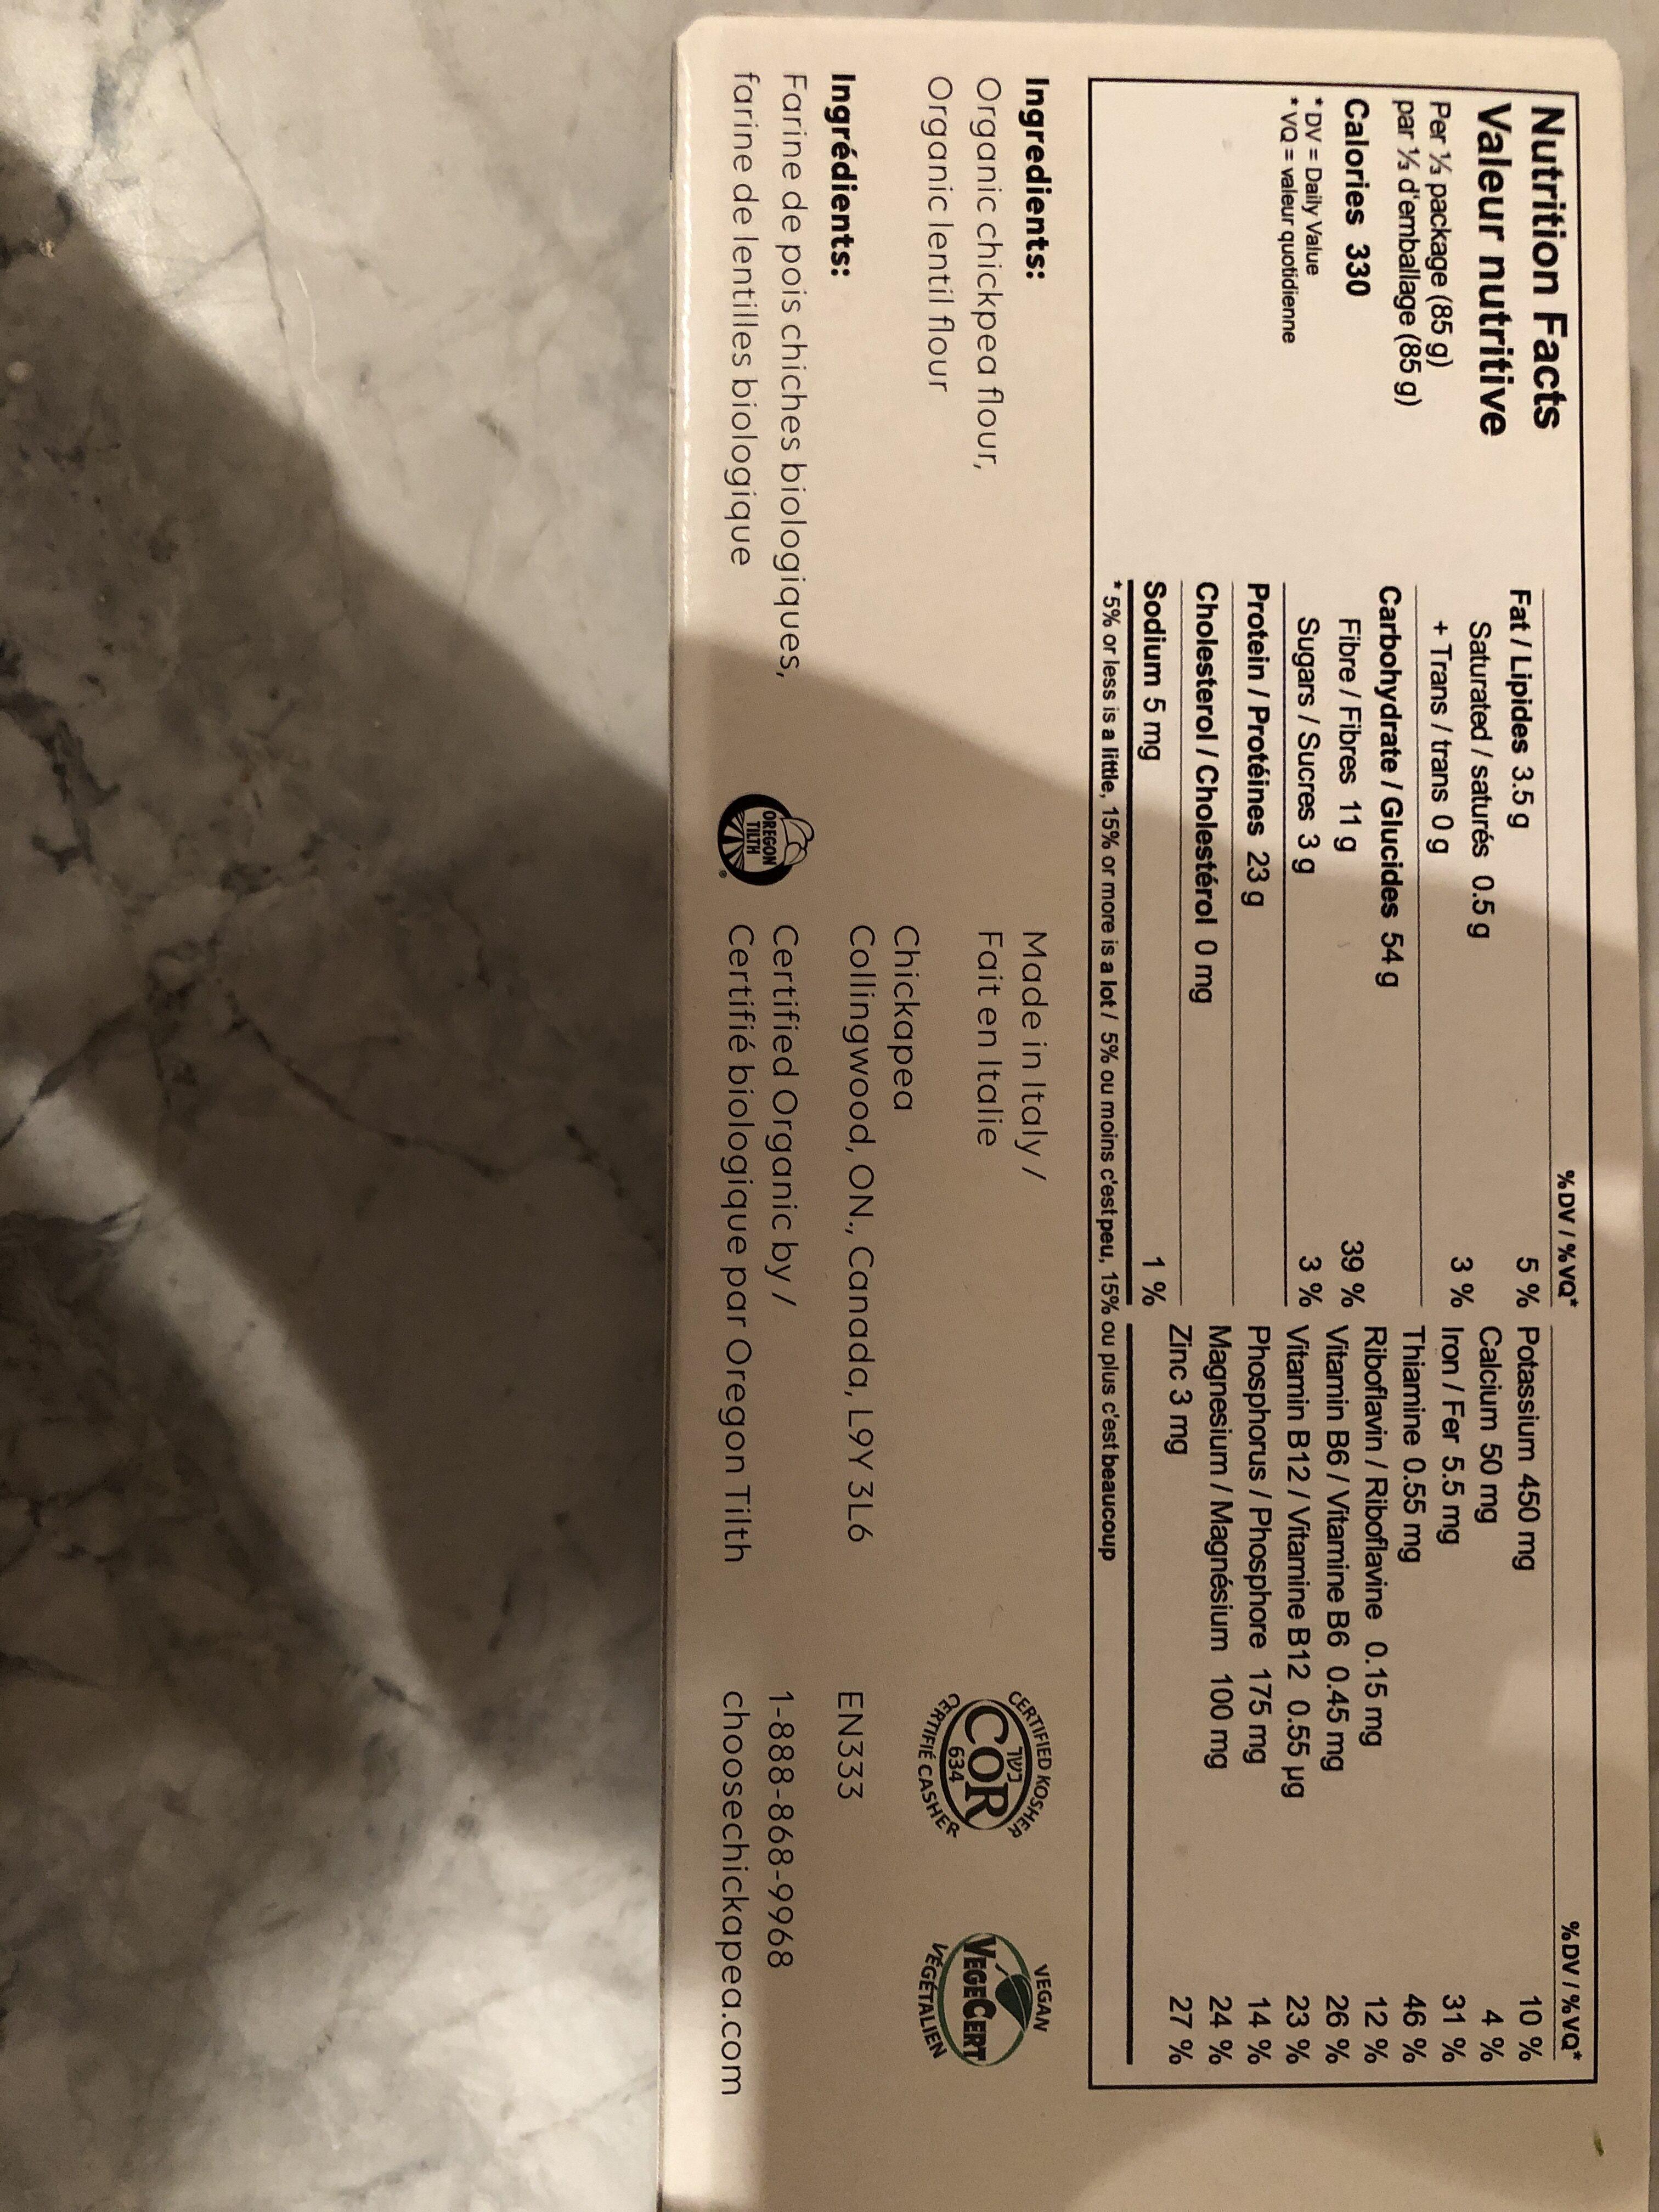 Organic Linguine - Informations nutritionnelles - fr